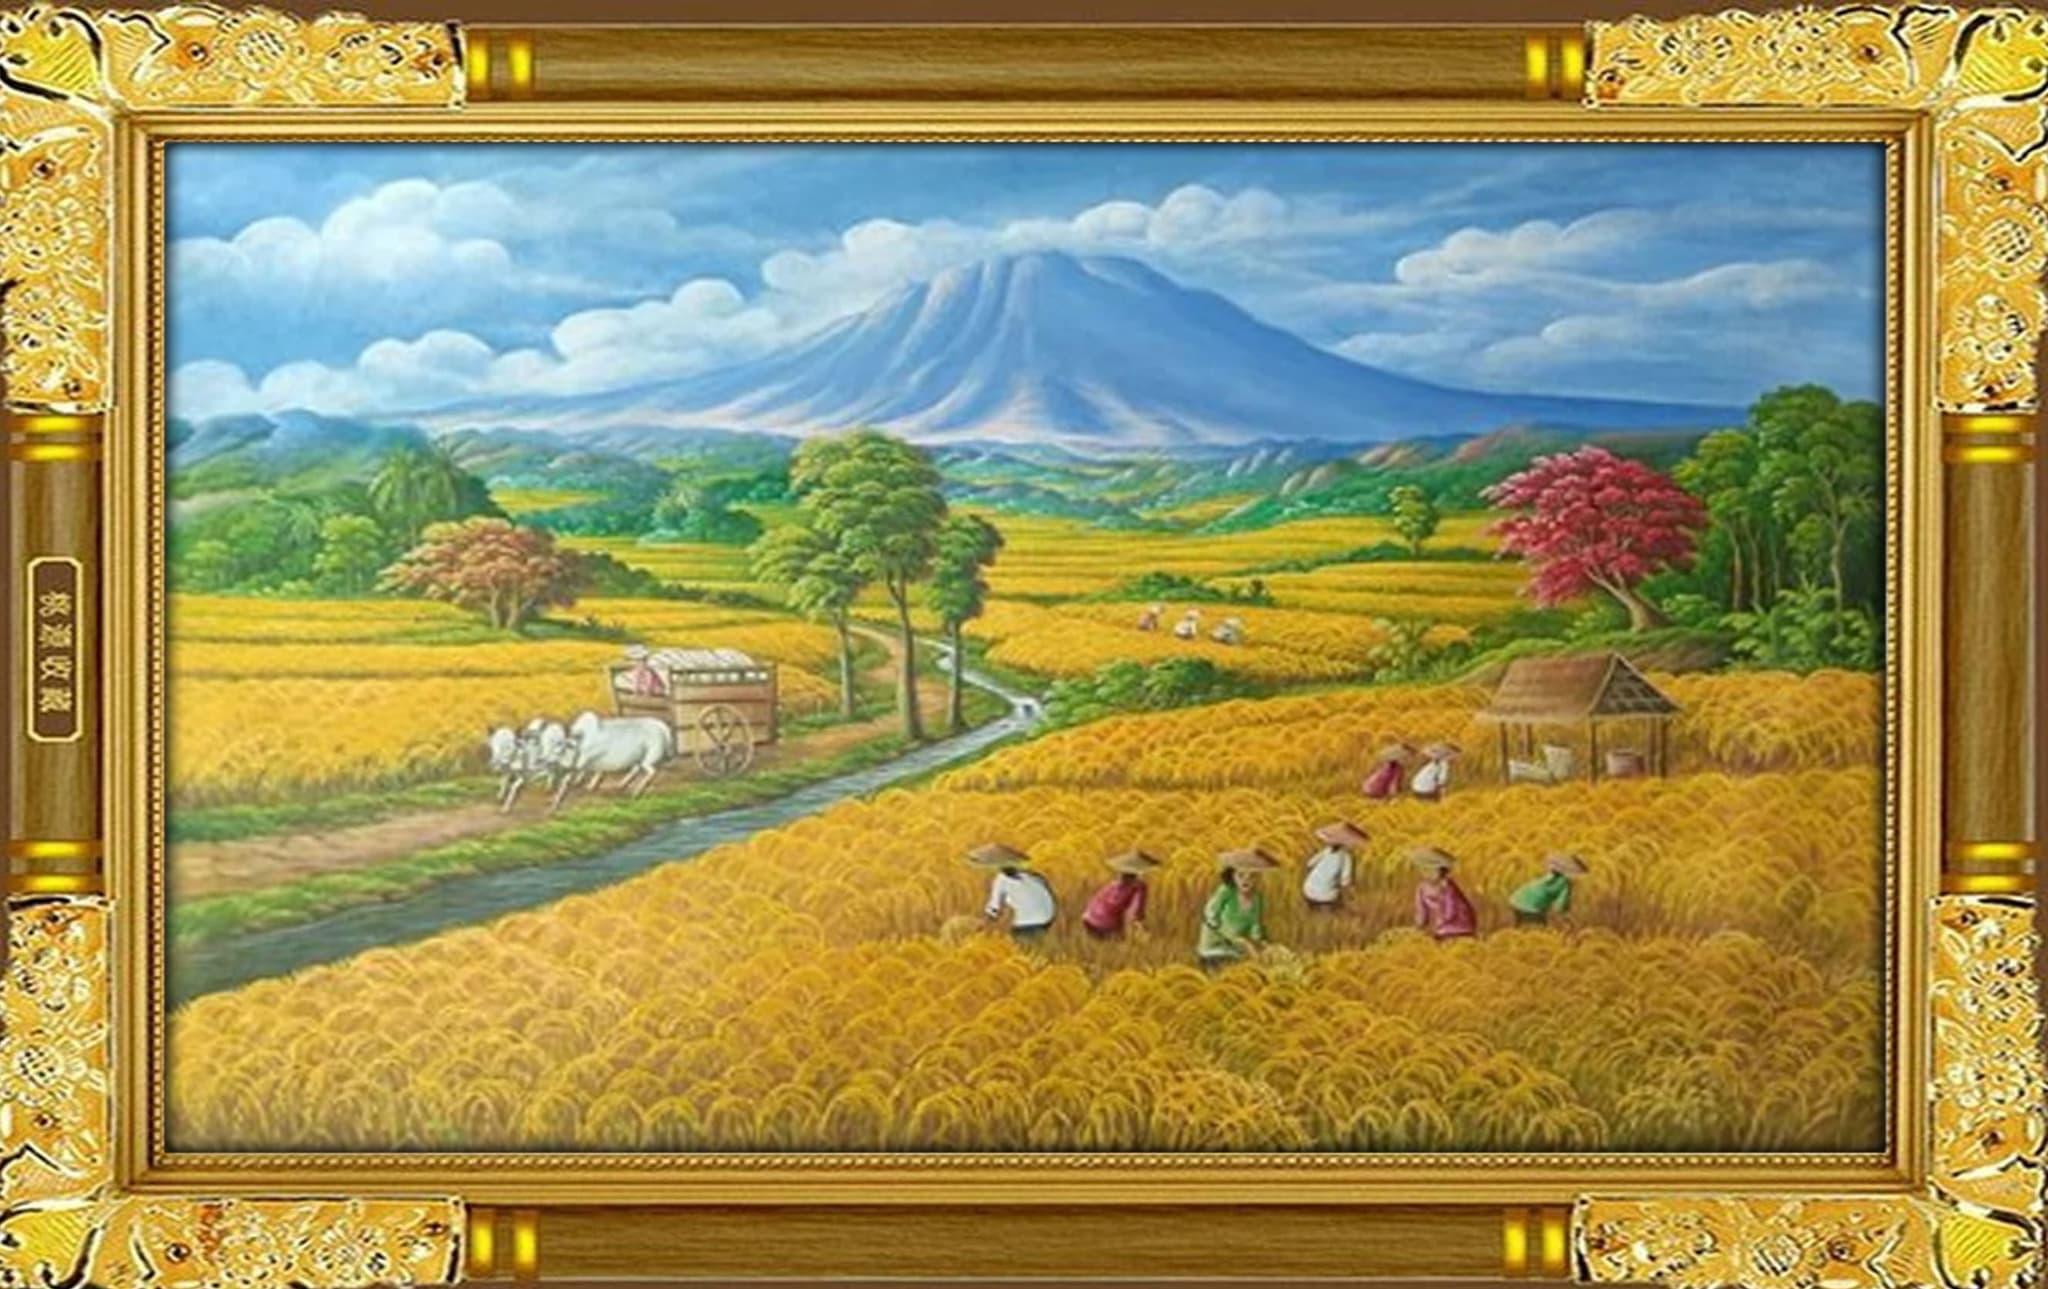 Lukisan Sawah Padi Hitam Putih